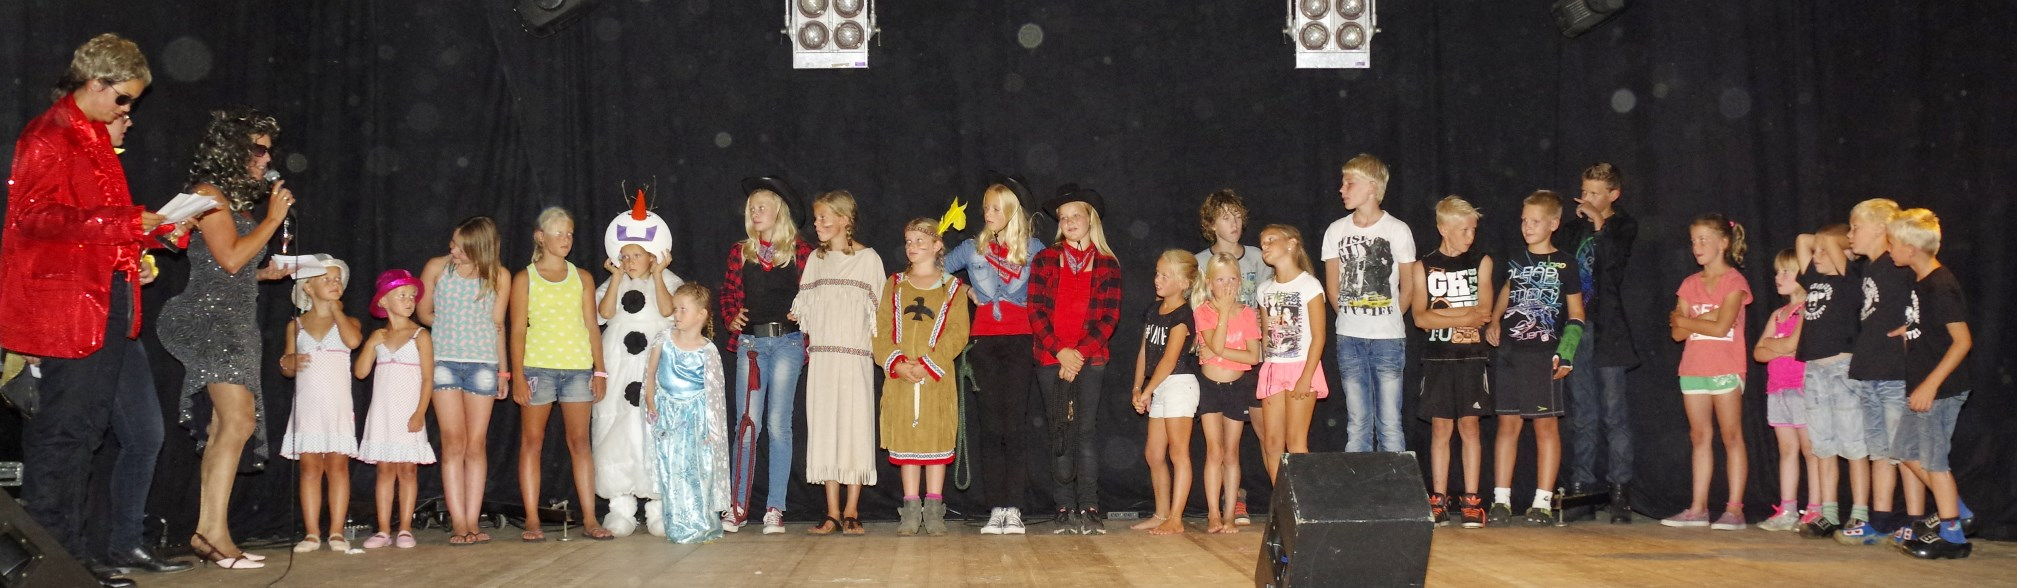 Polderfeest 2015